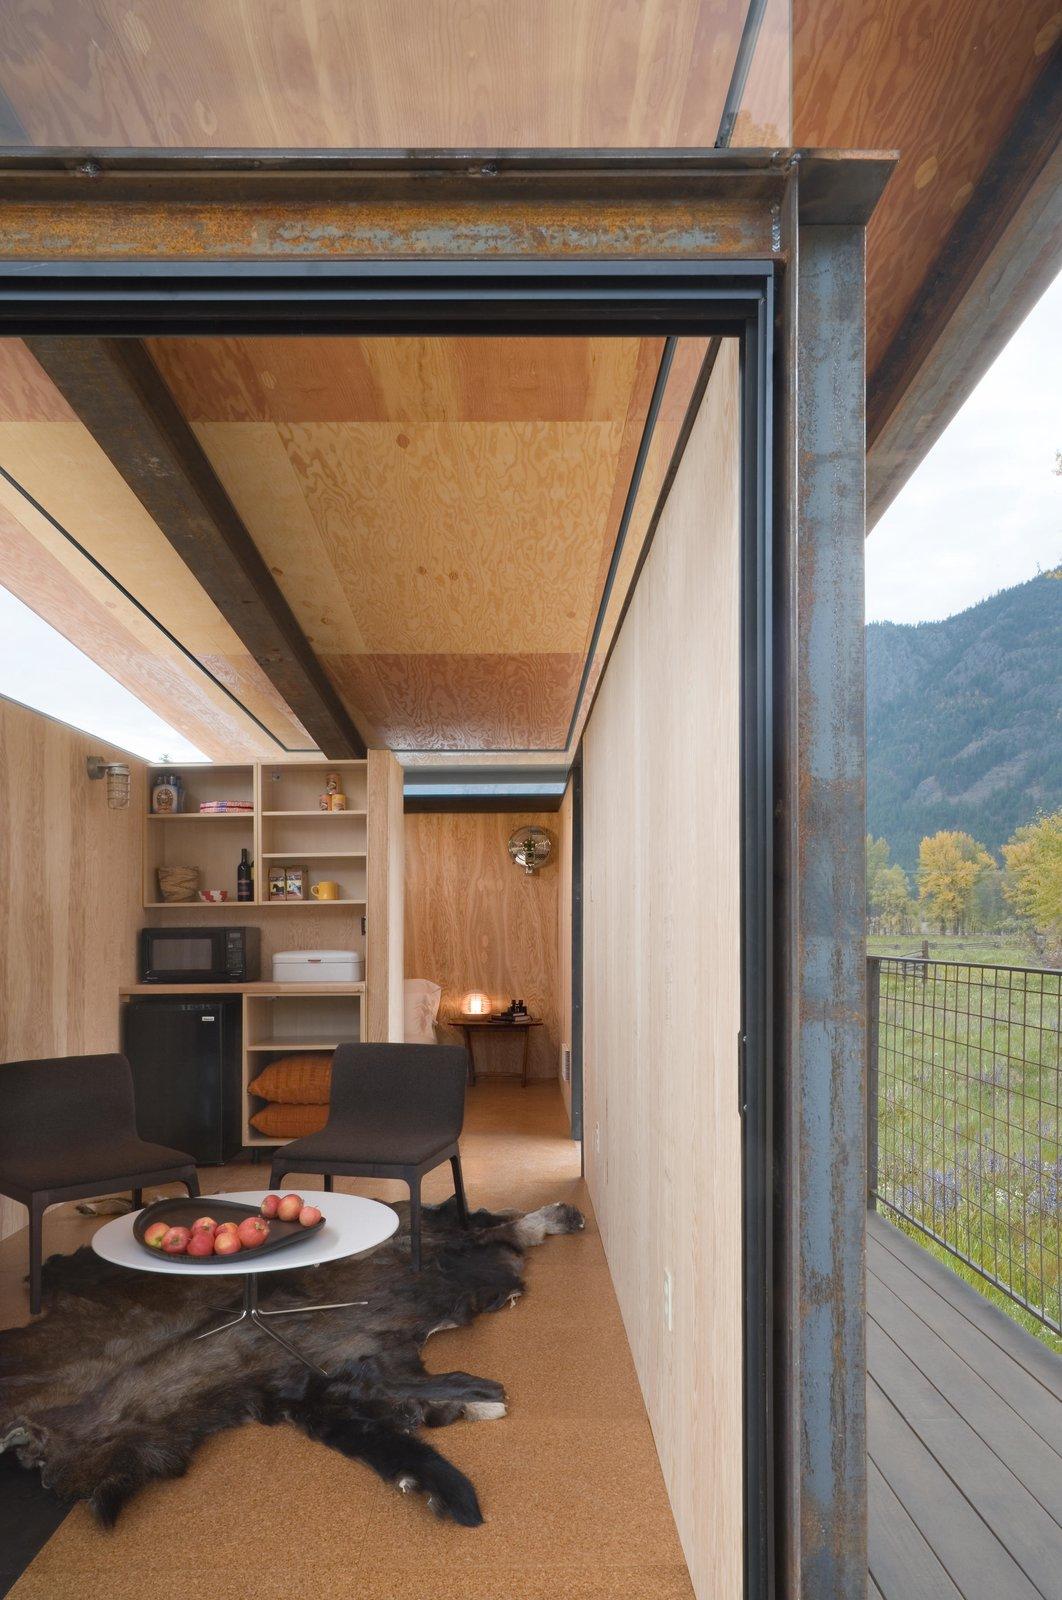 Living Room Rolling Huts | Olson Kundig  Rolling Huts by Olson Kundig